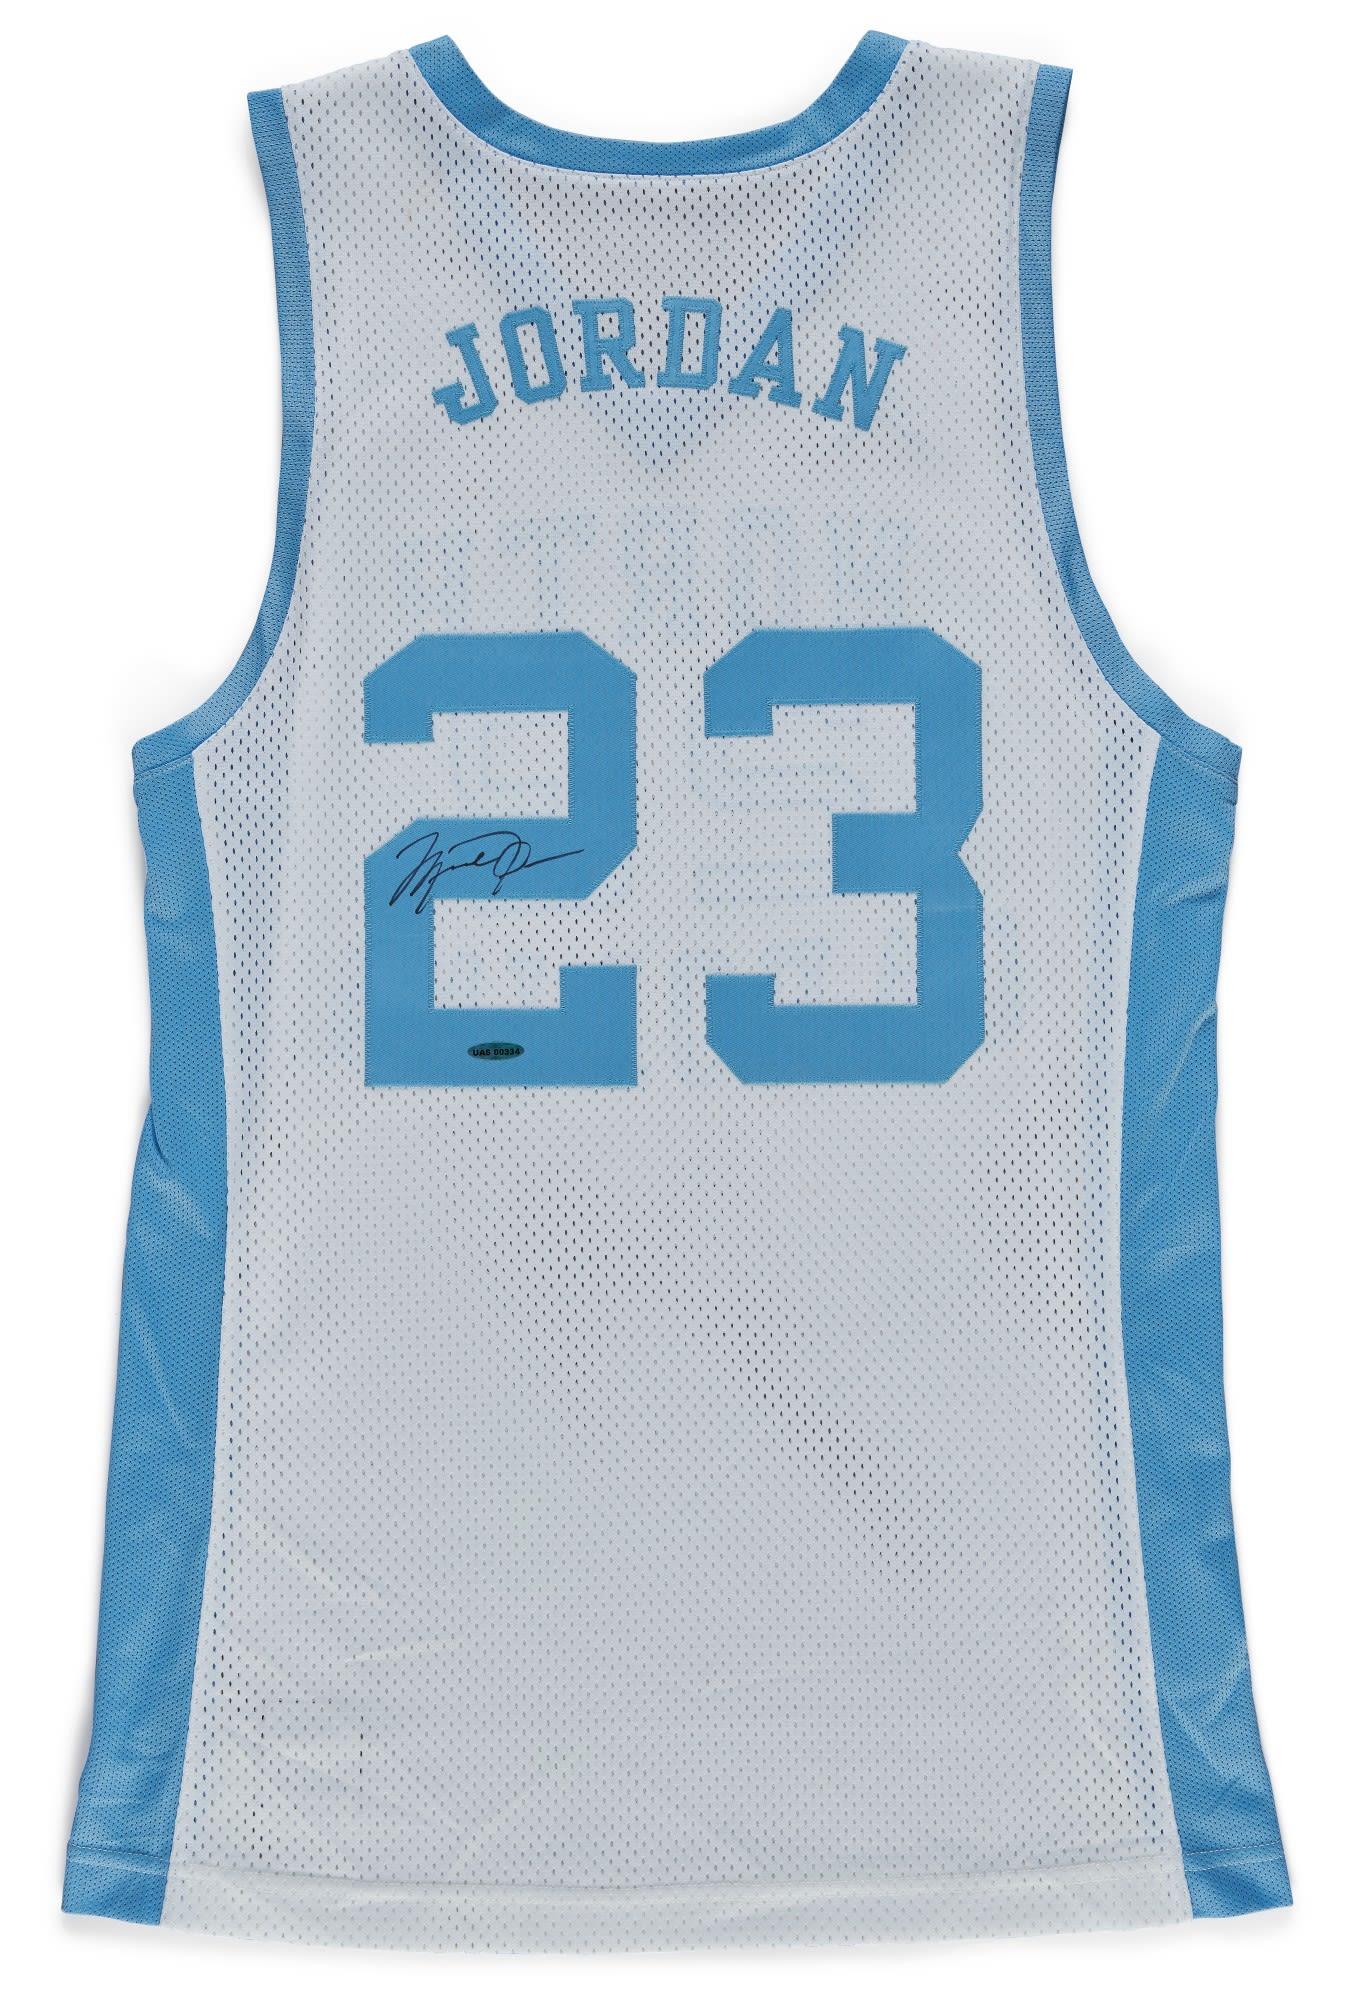 Jordan Brand x Converse 'UNC' Jersey 2012 Sotheby's Auction